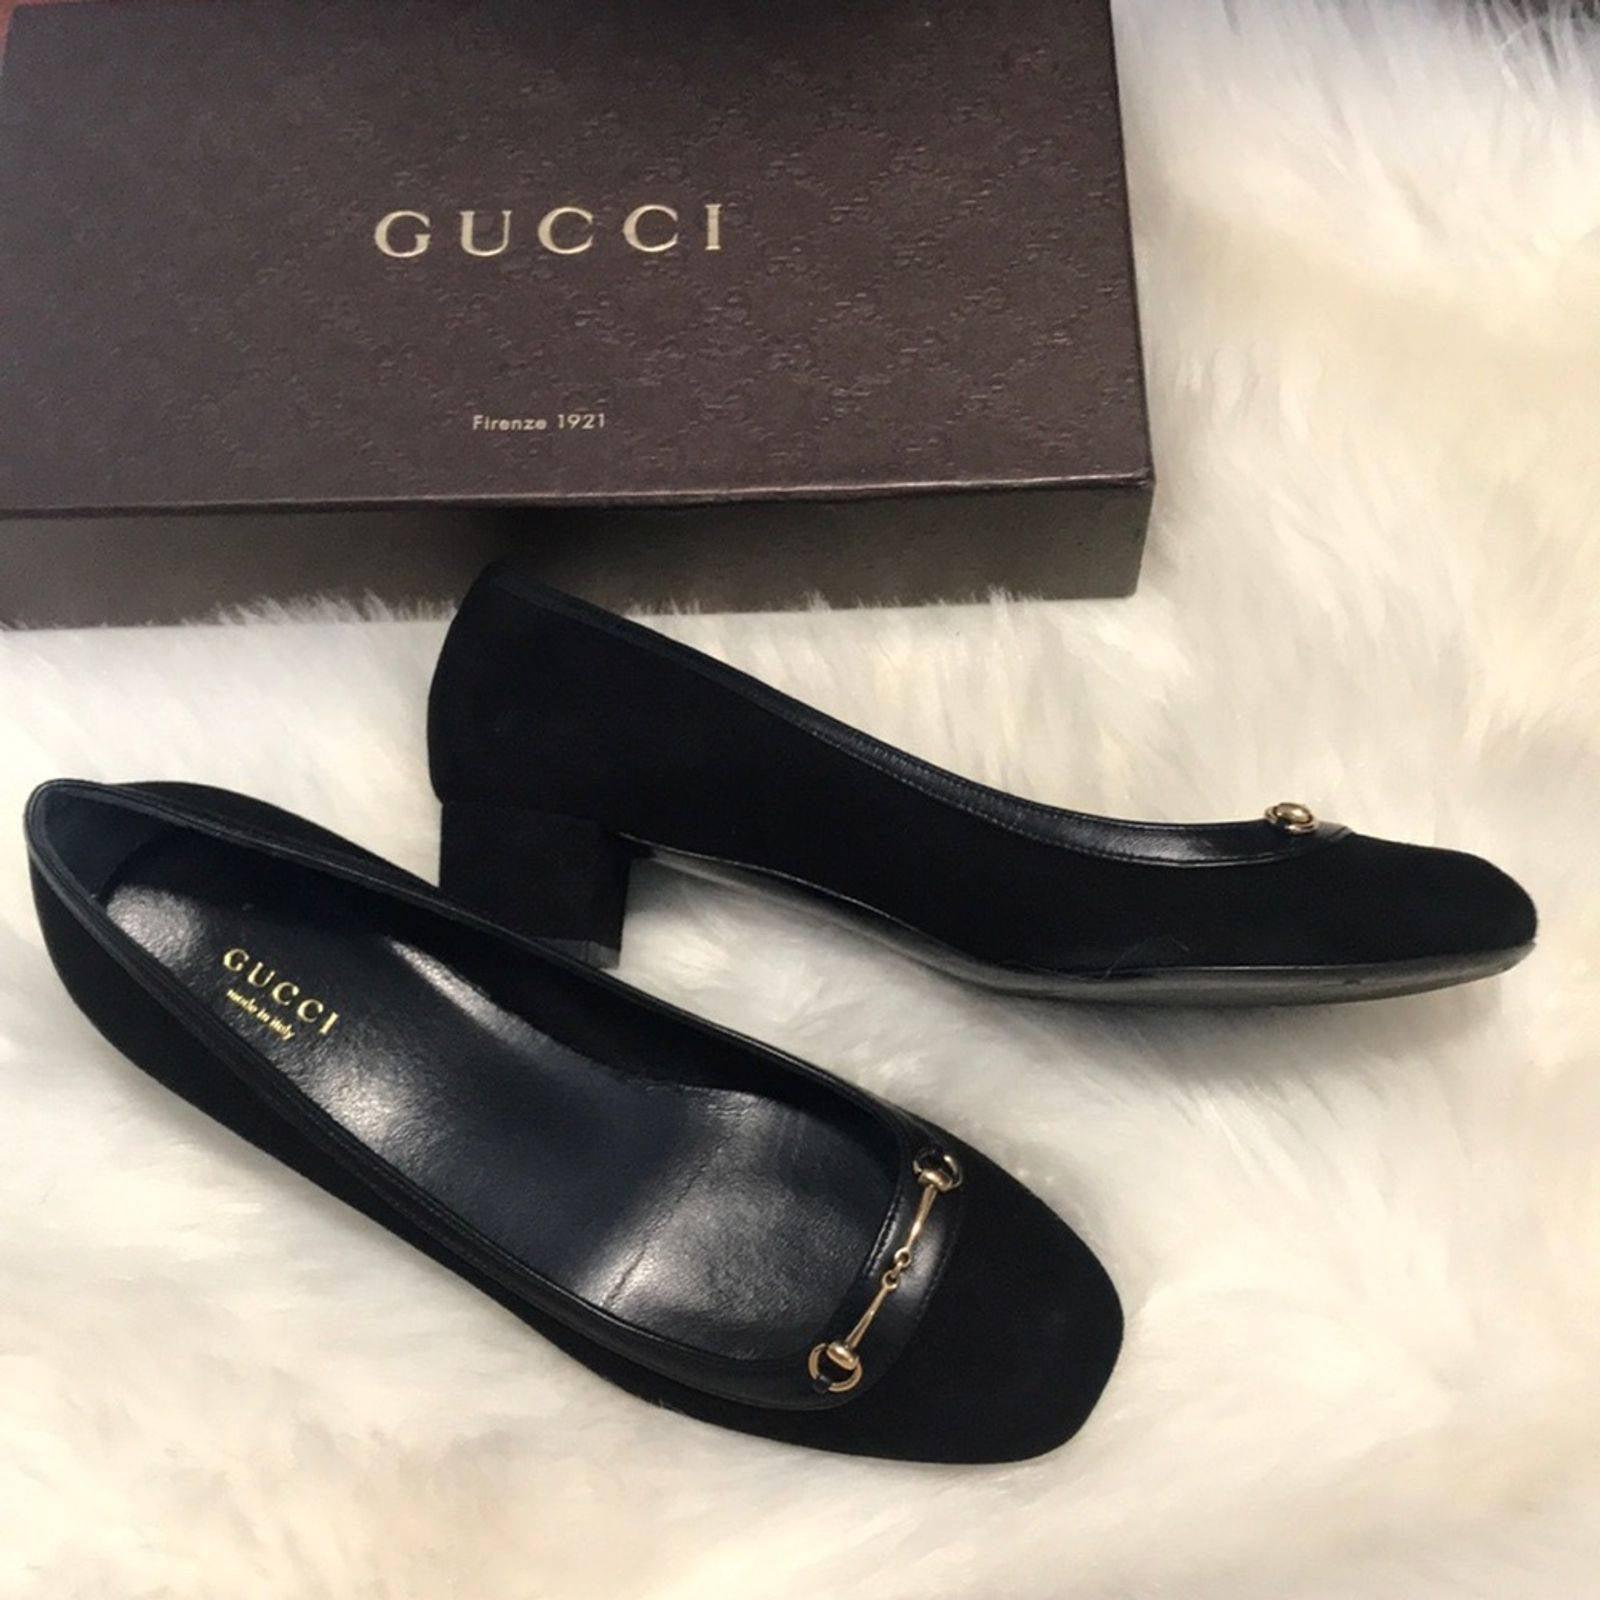 Gucci suede Block Heels Black Shoes